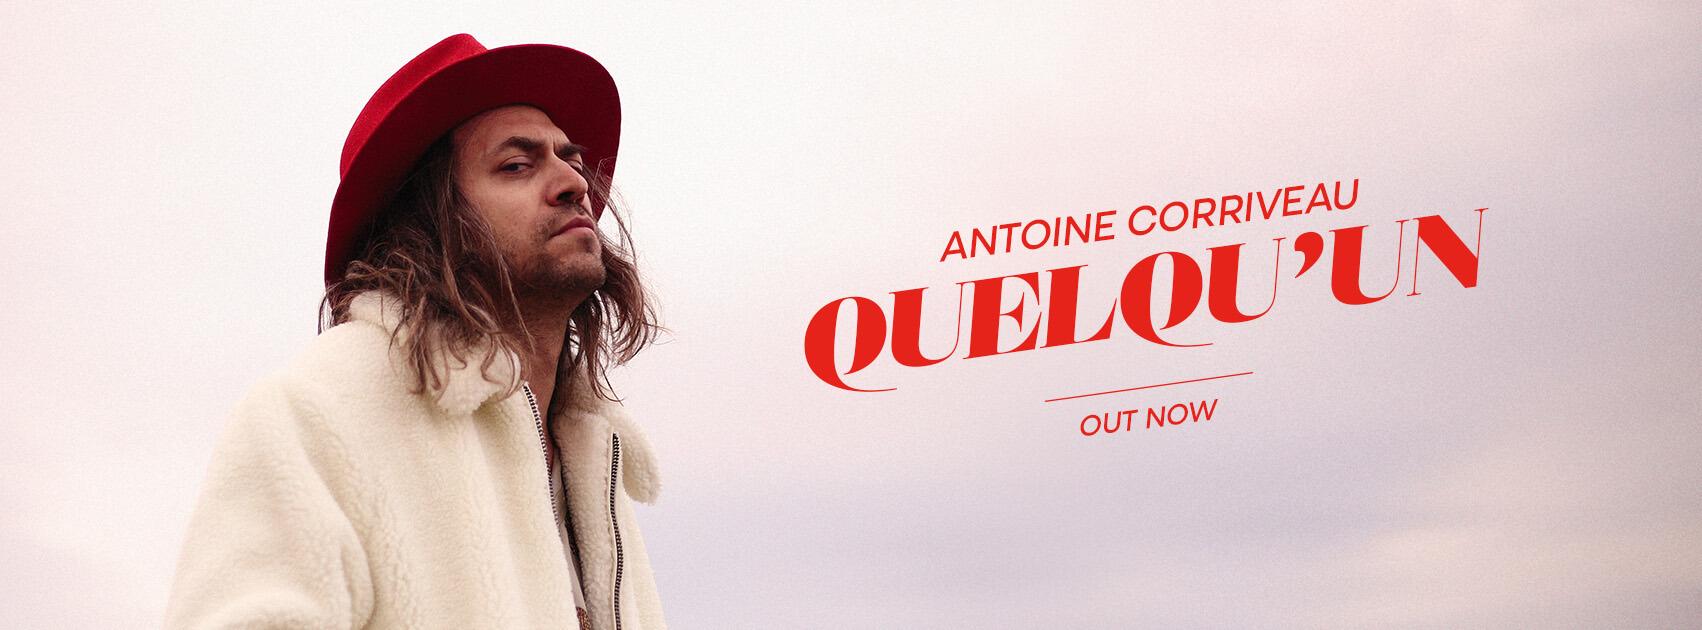 AntoineCorriveau-QQN-SCRWebsite-EN